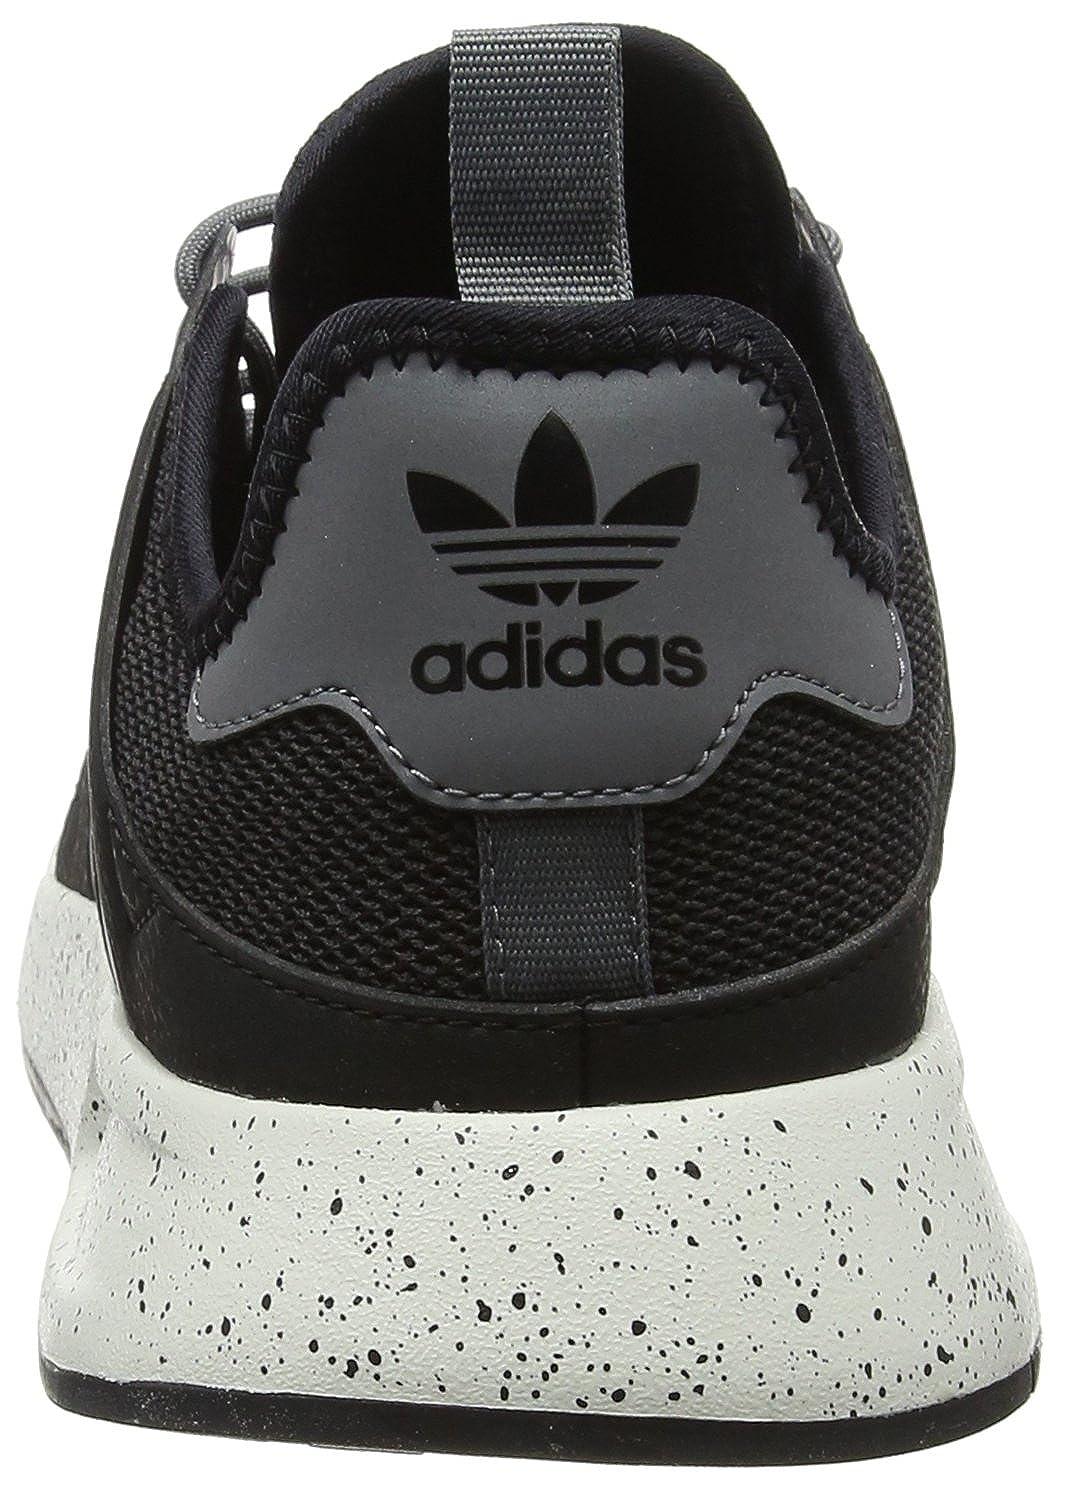 sports shoes 29b4a e1b3a adidas By9254 Sneaker a Collo Basso Unisex - Adulto  MainApps  Amazon.it   Scarpe e borse